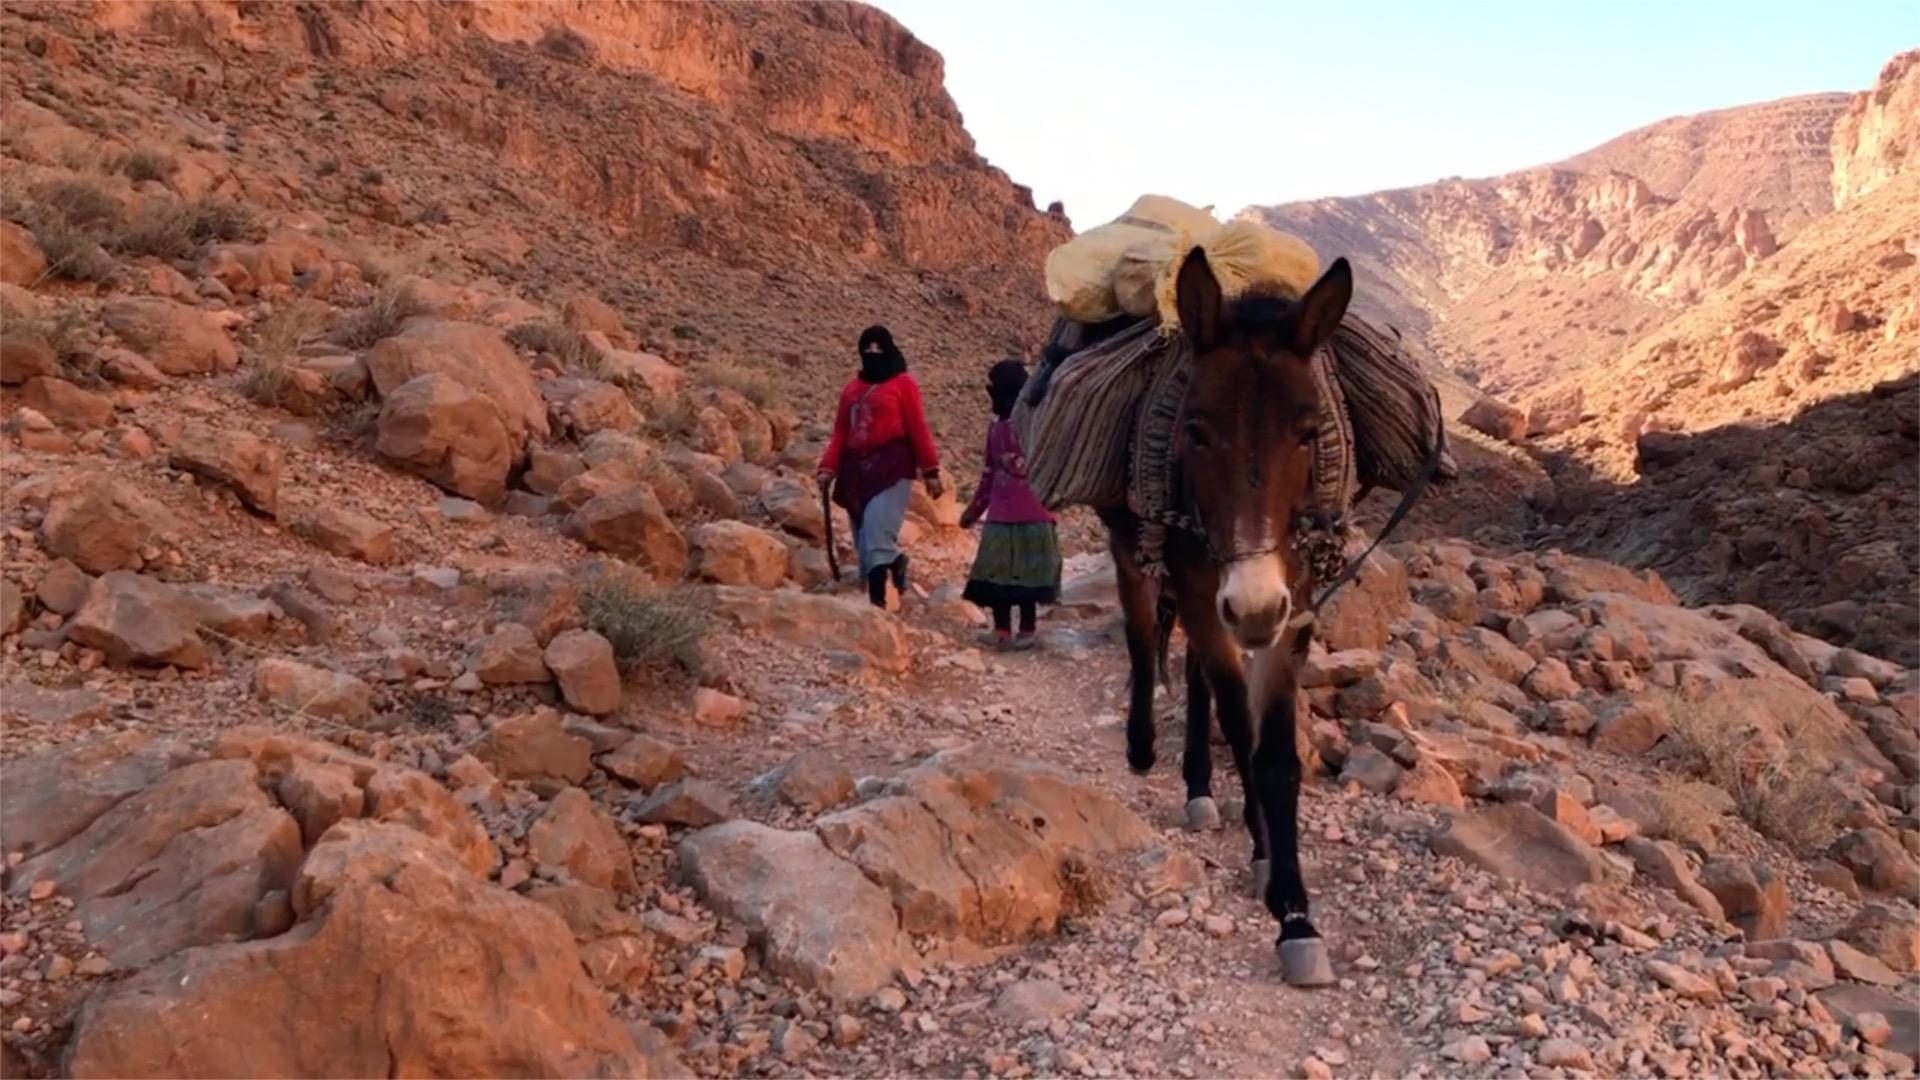 Povos nomades, Todra